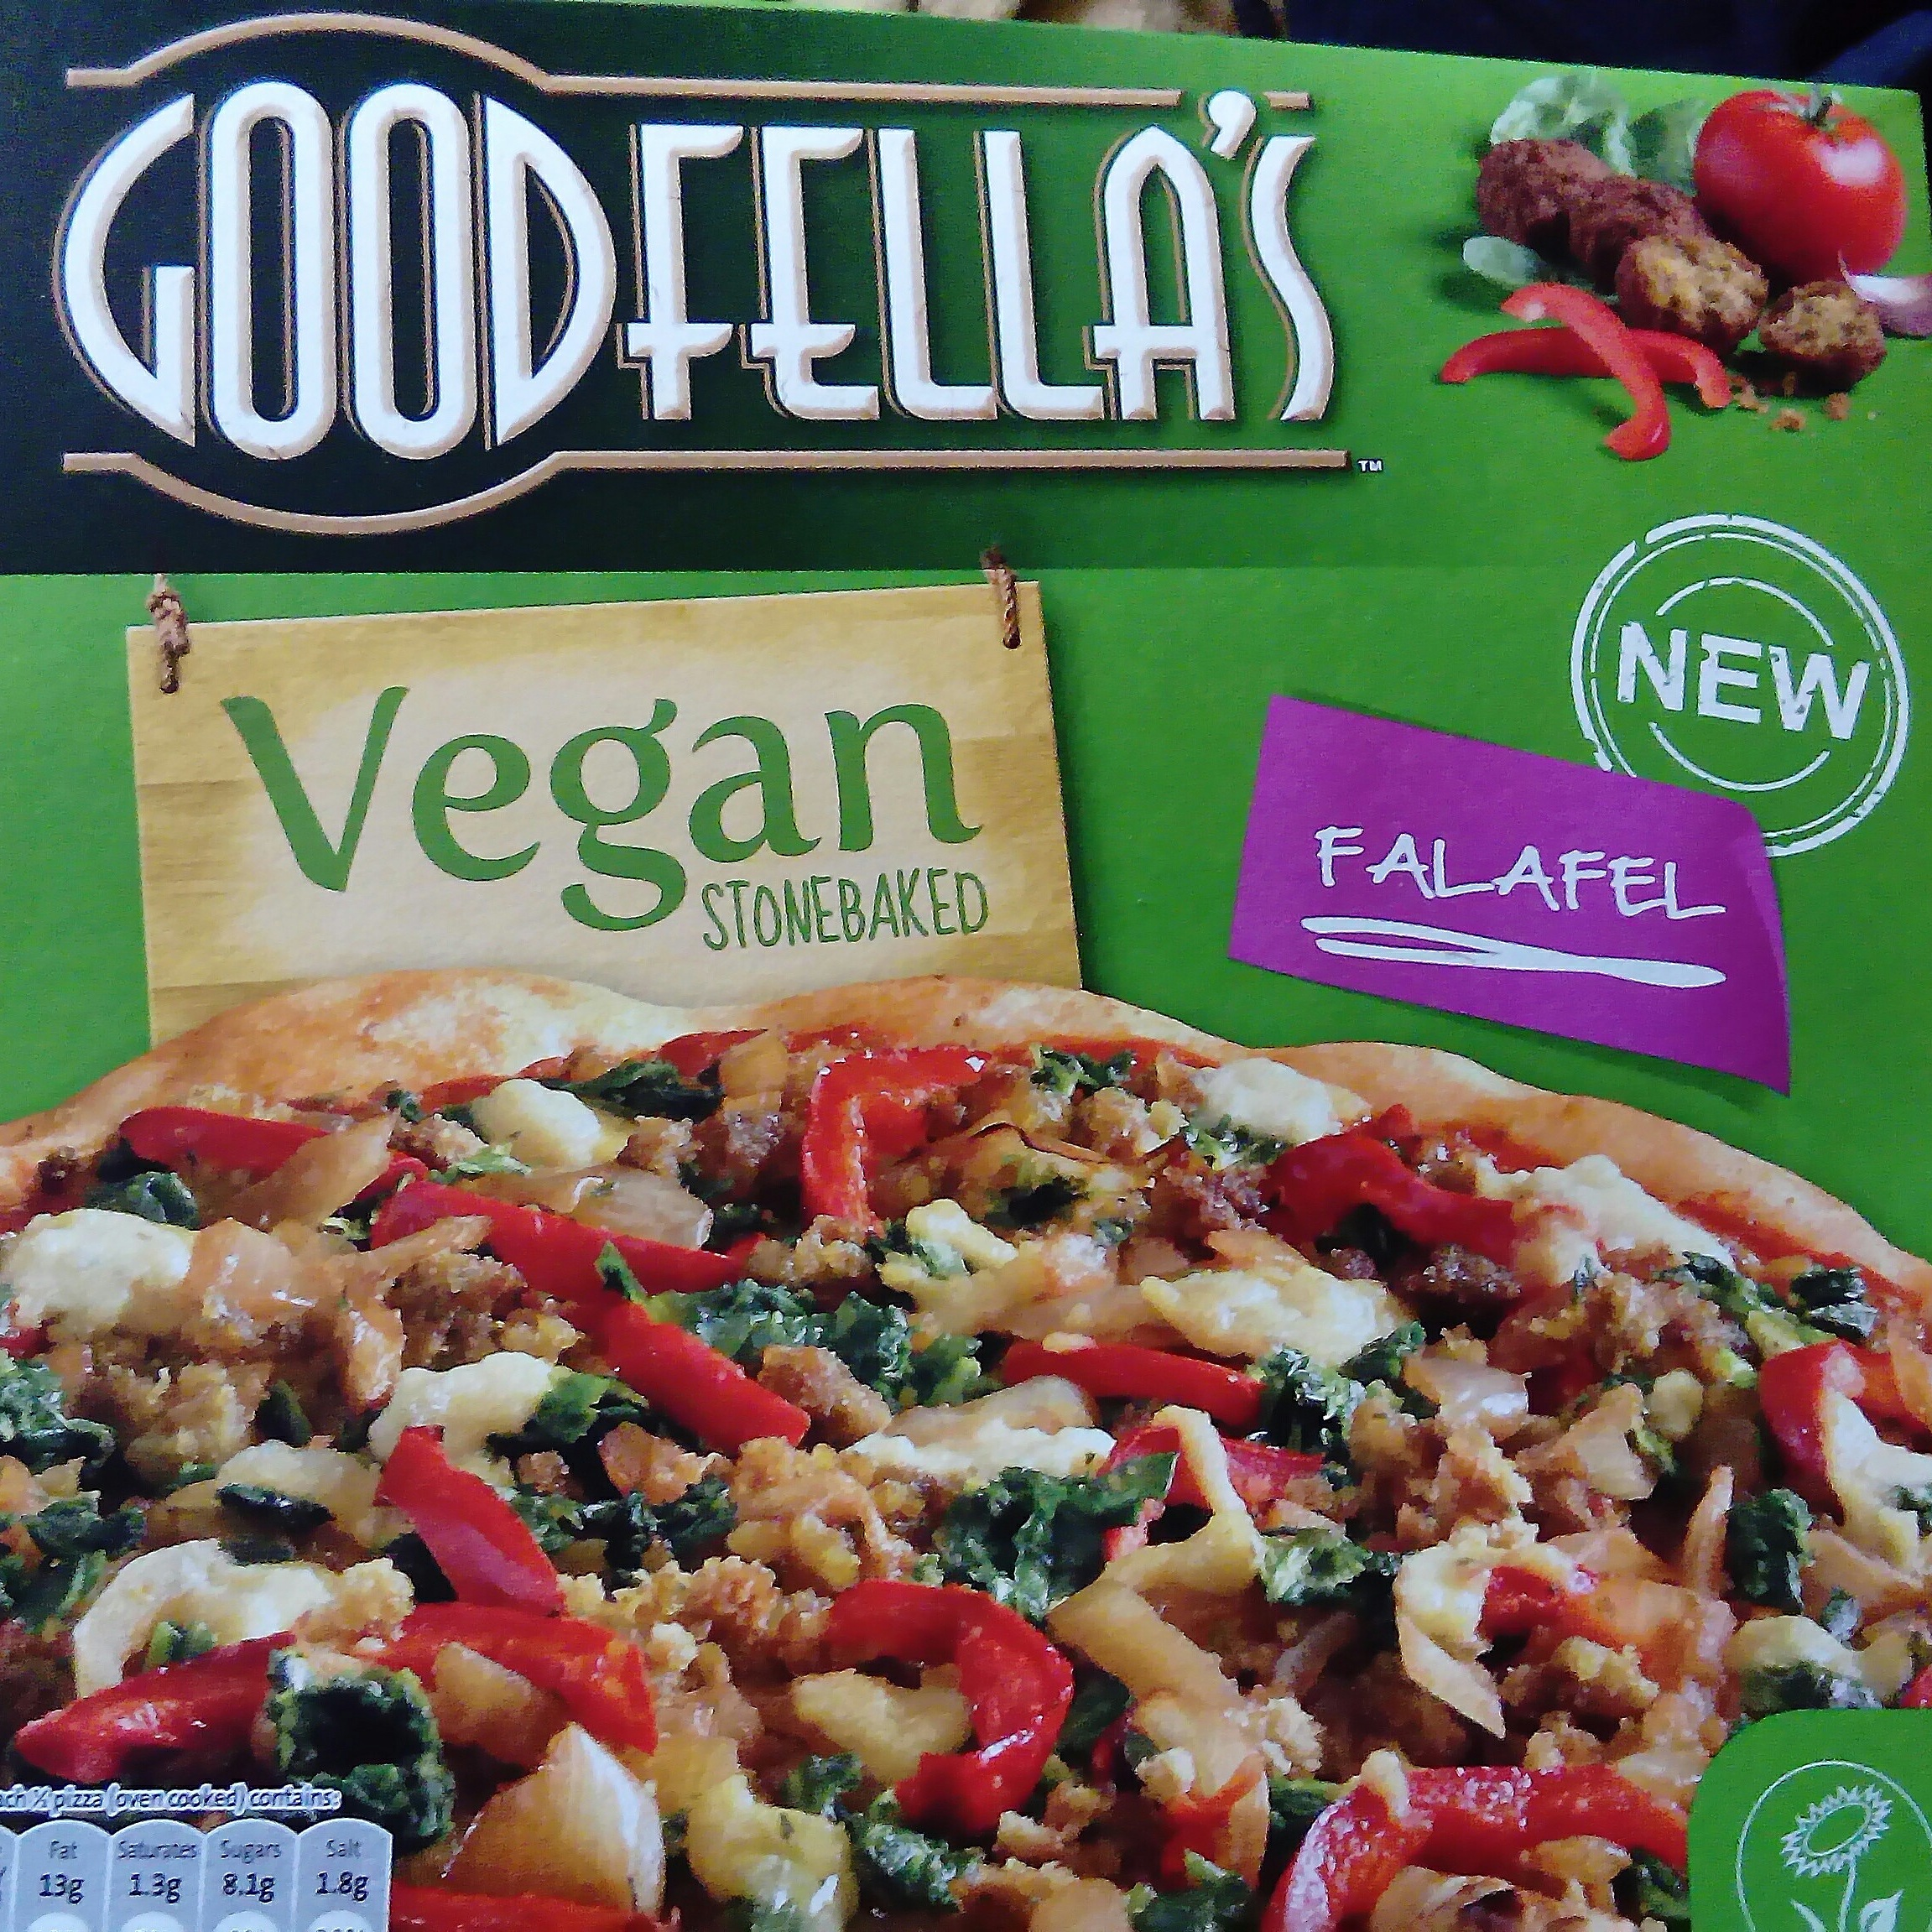 Review Goodfellas Vegan Stonebaked Falafel Pizza Vegan